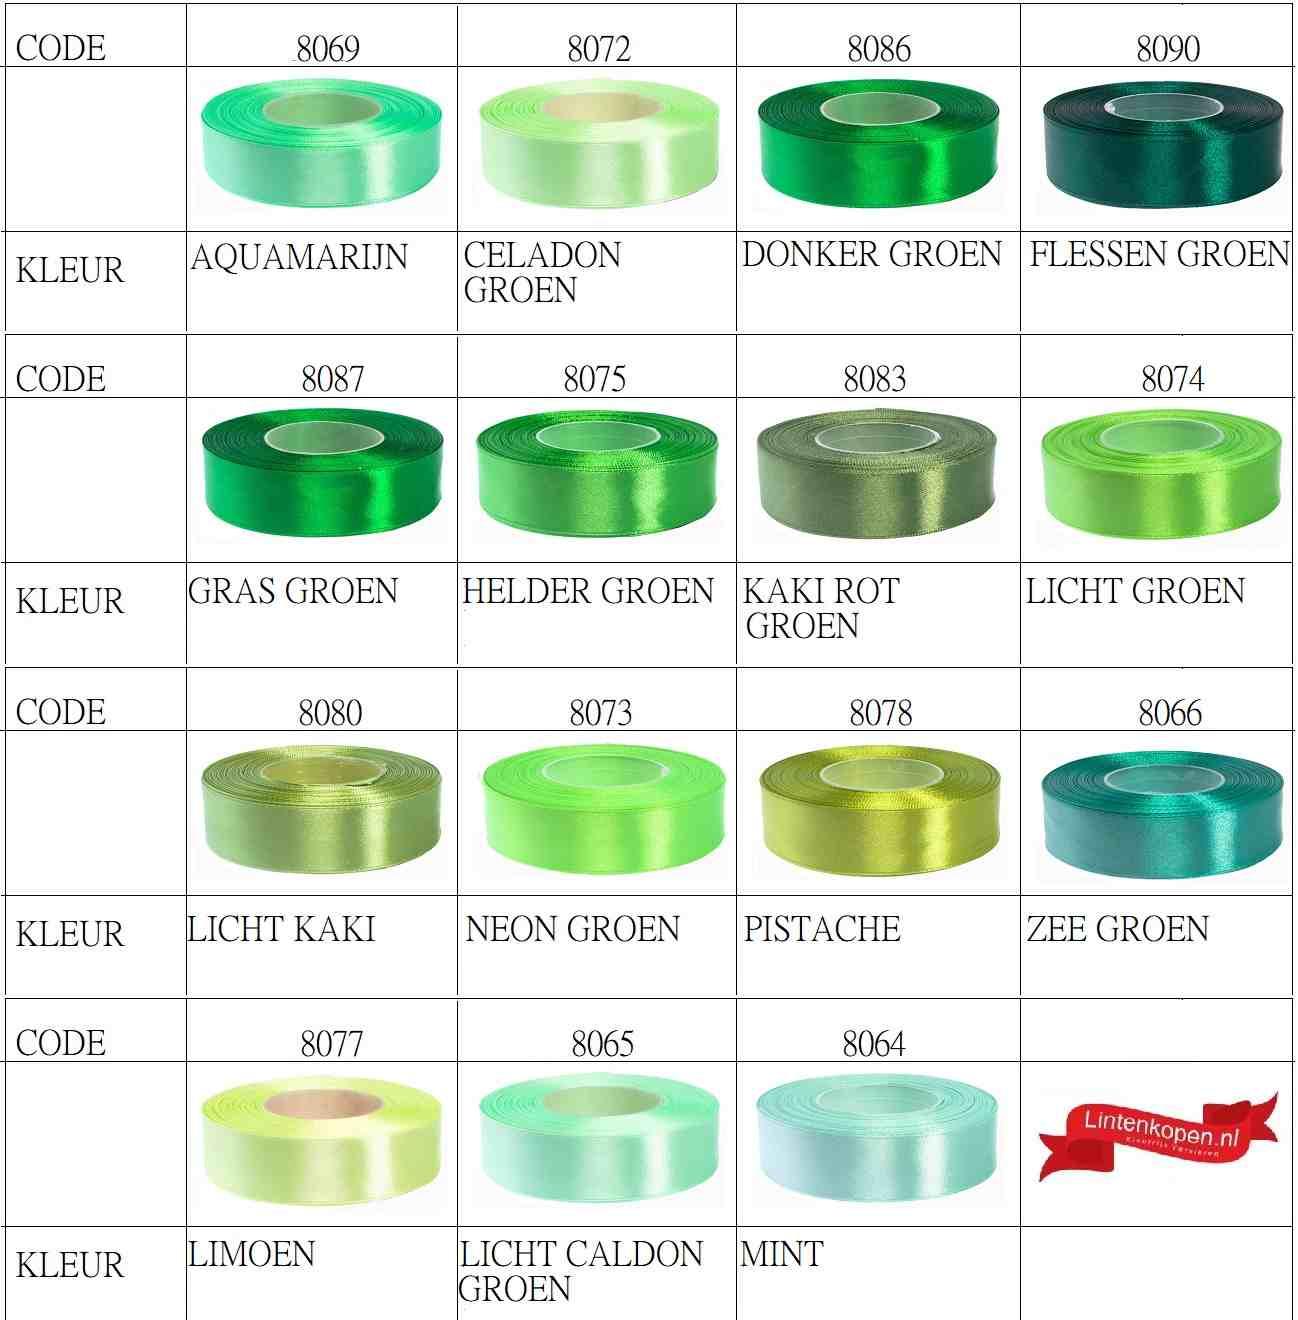 groene satijn linten